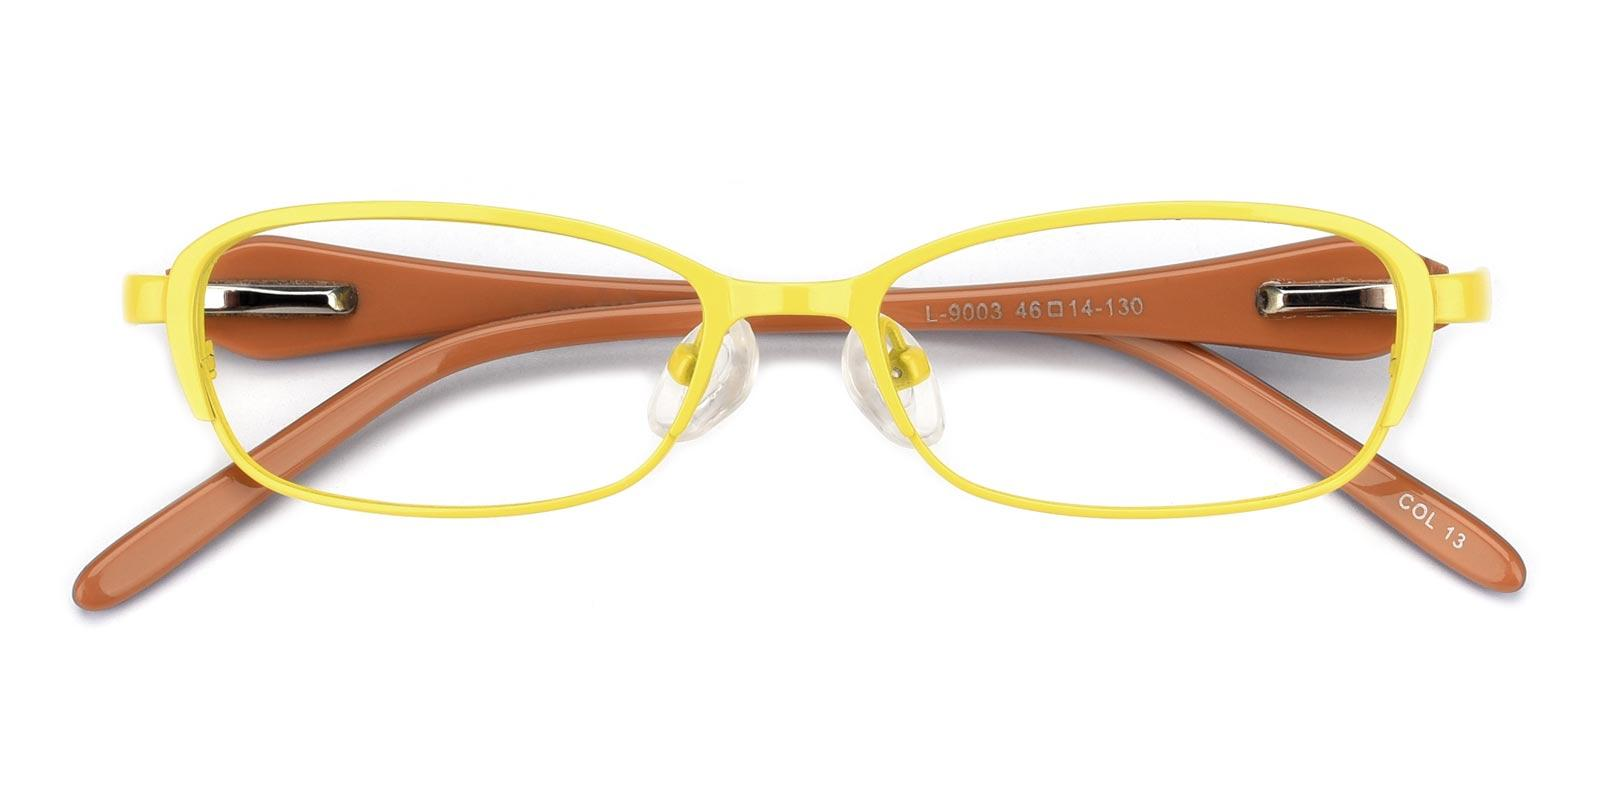 Lemon-Yellow-Rectangle-Metal-Eyeglasses-detail